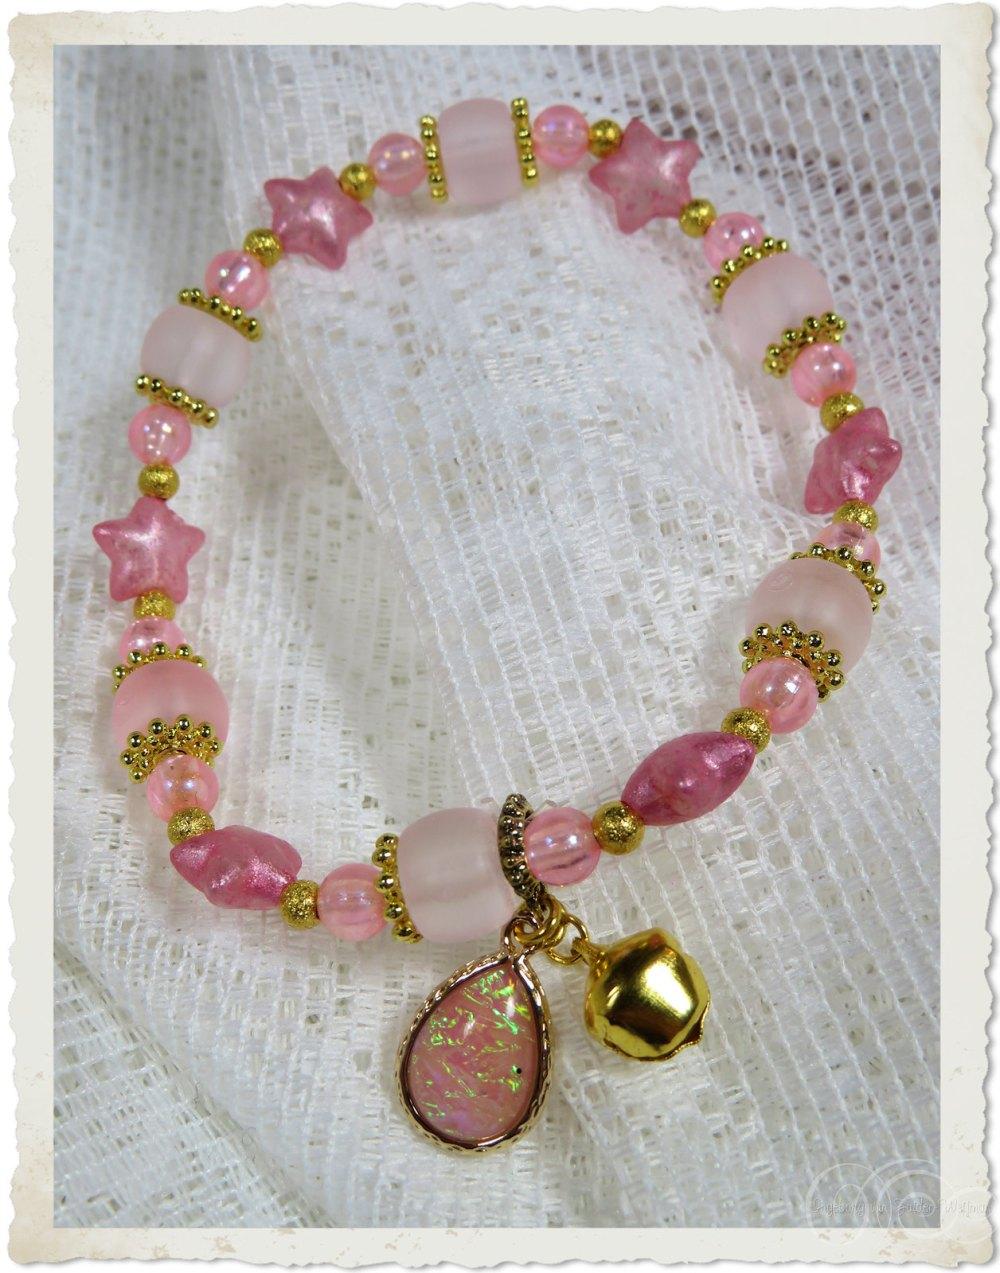 Pink bracelet with stars and bell by Ingeborg van Zuiden